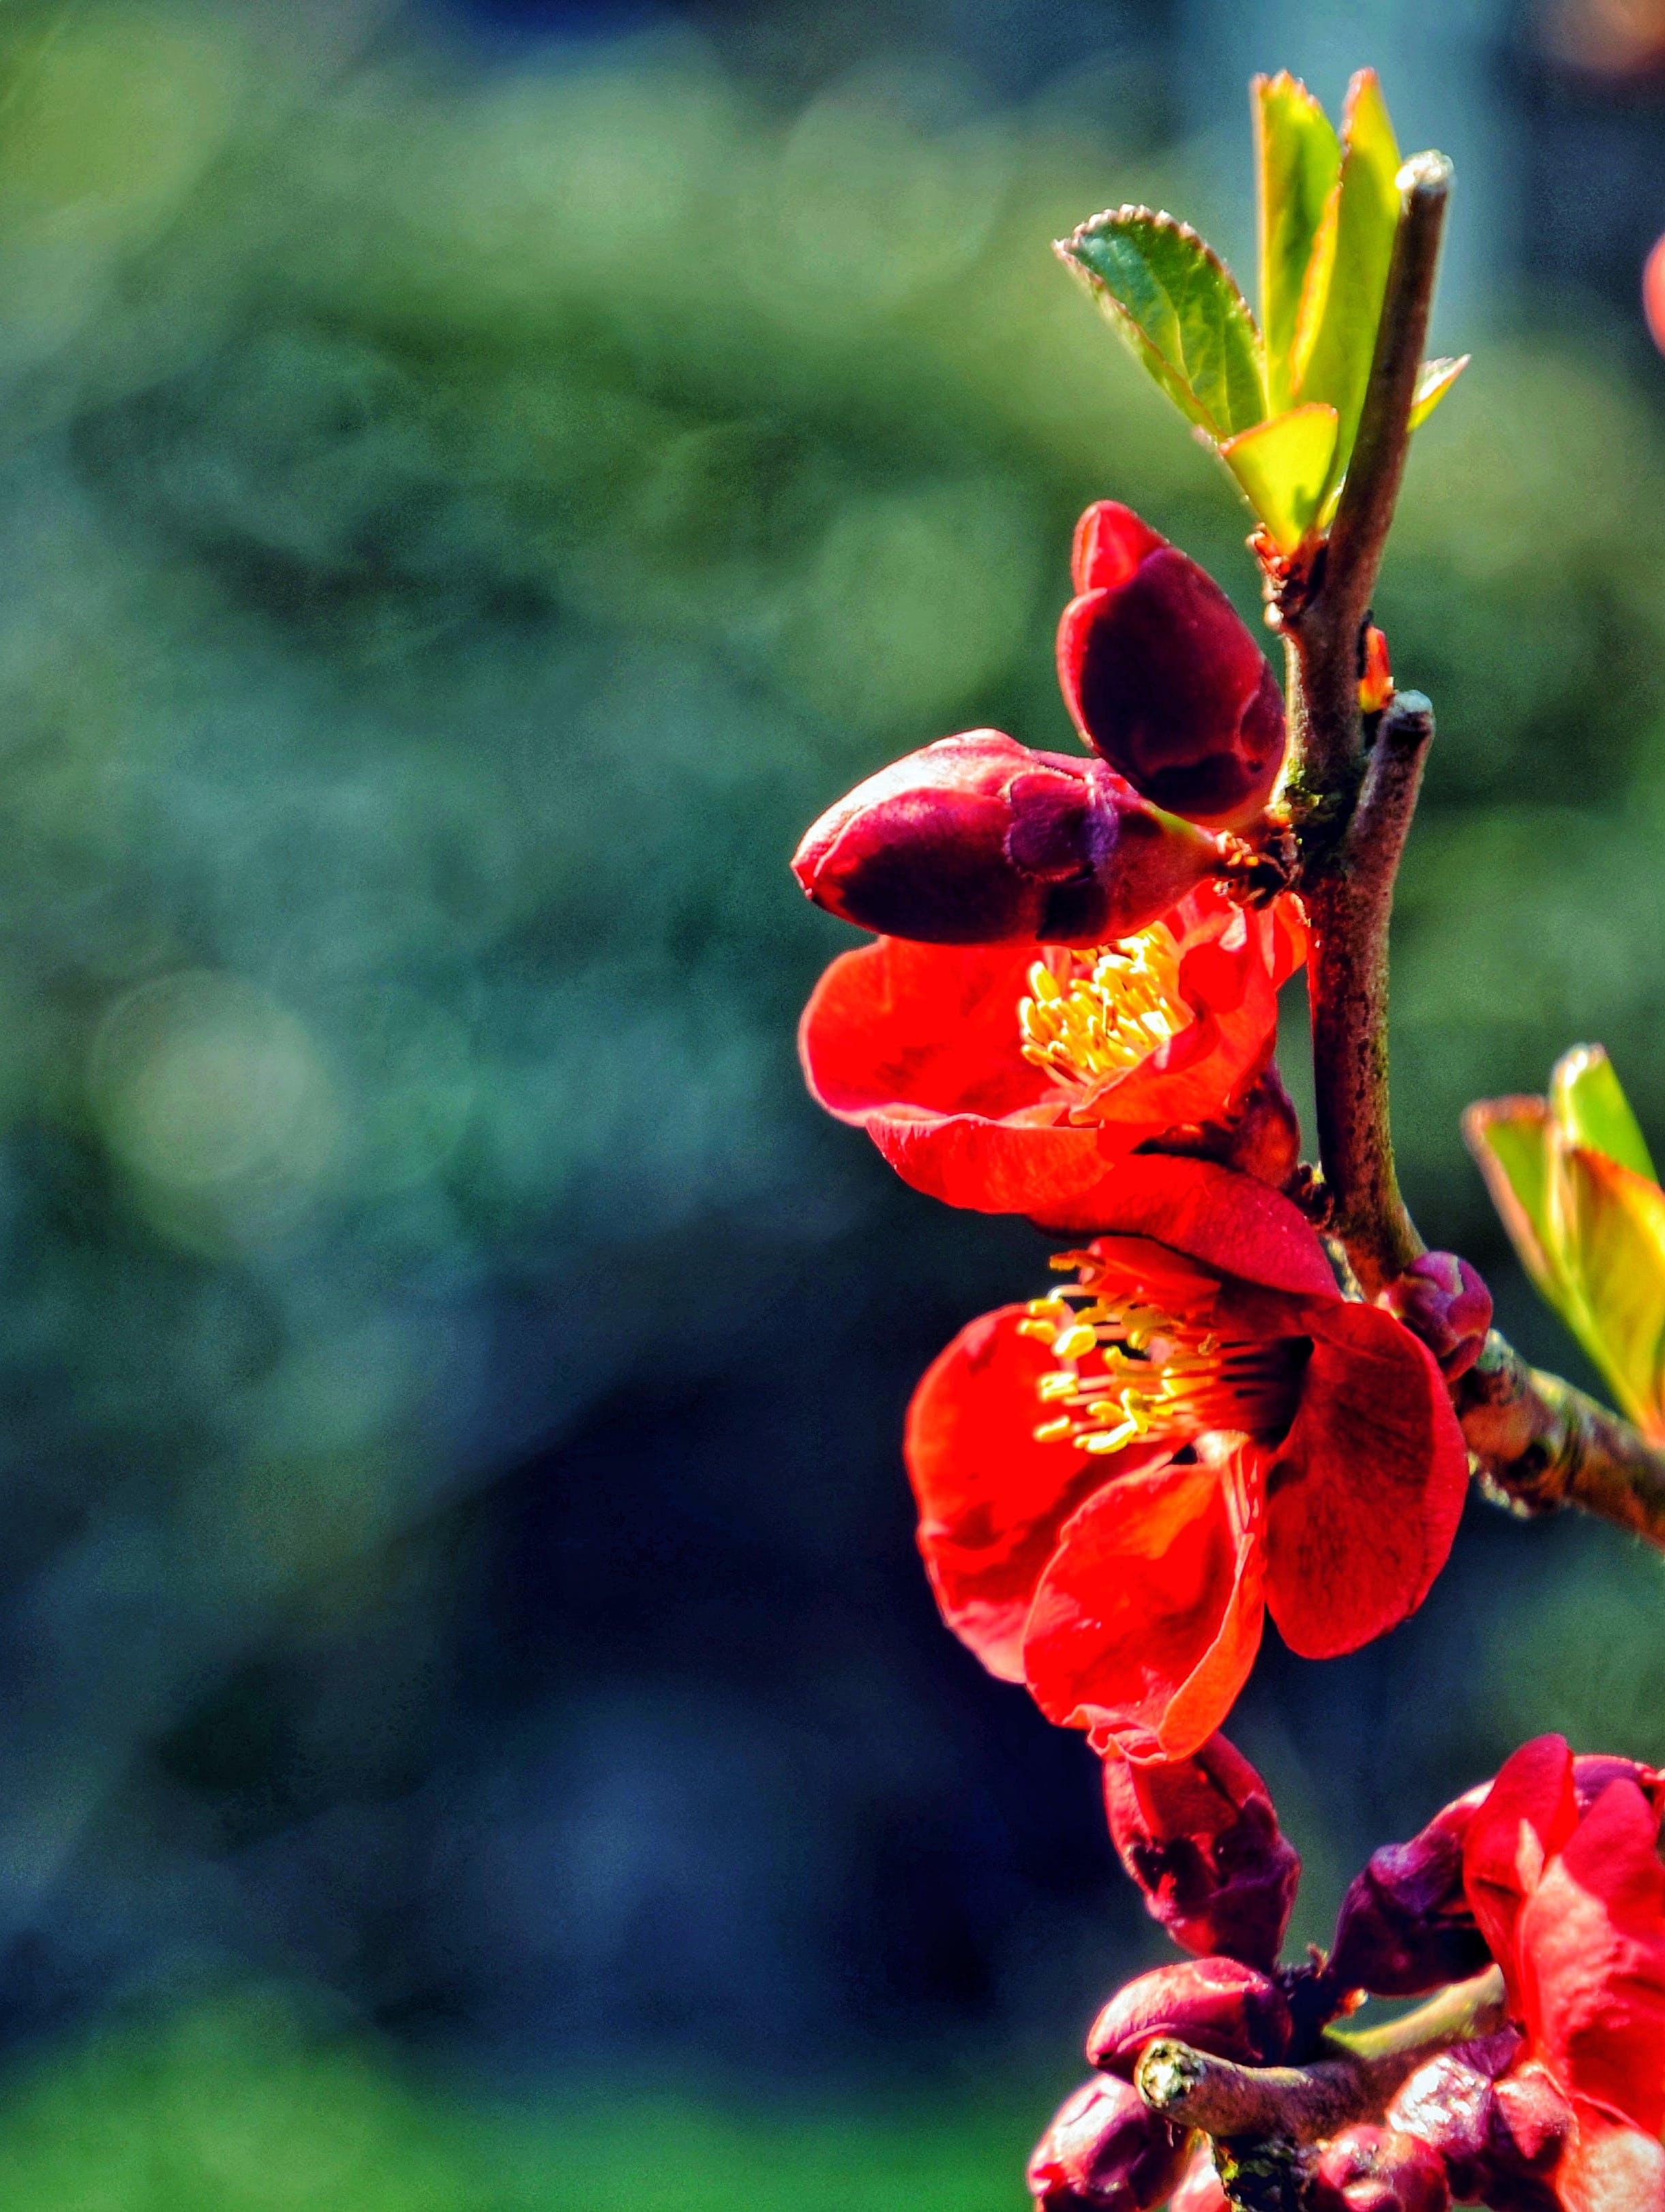 Free stock photo of cherry, cherry blossom, flower, HD